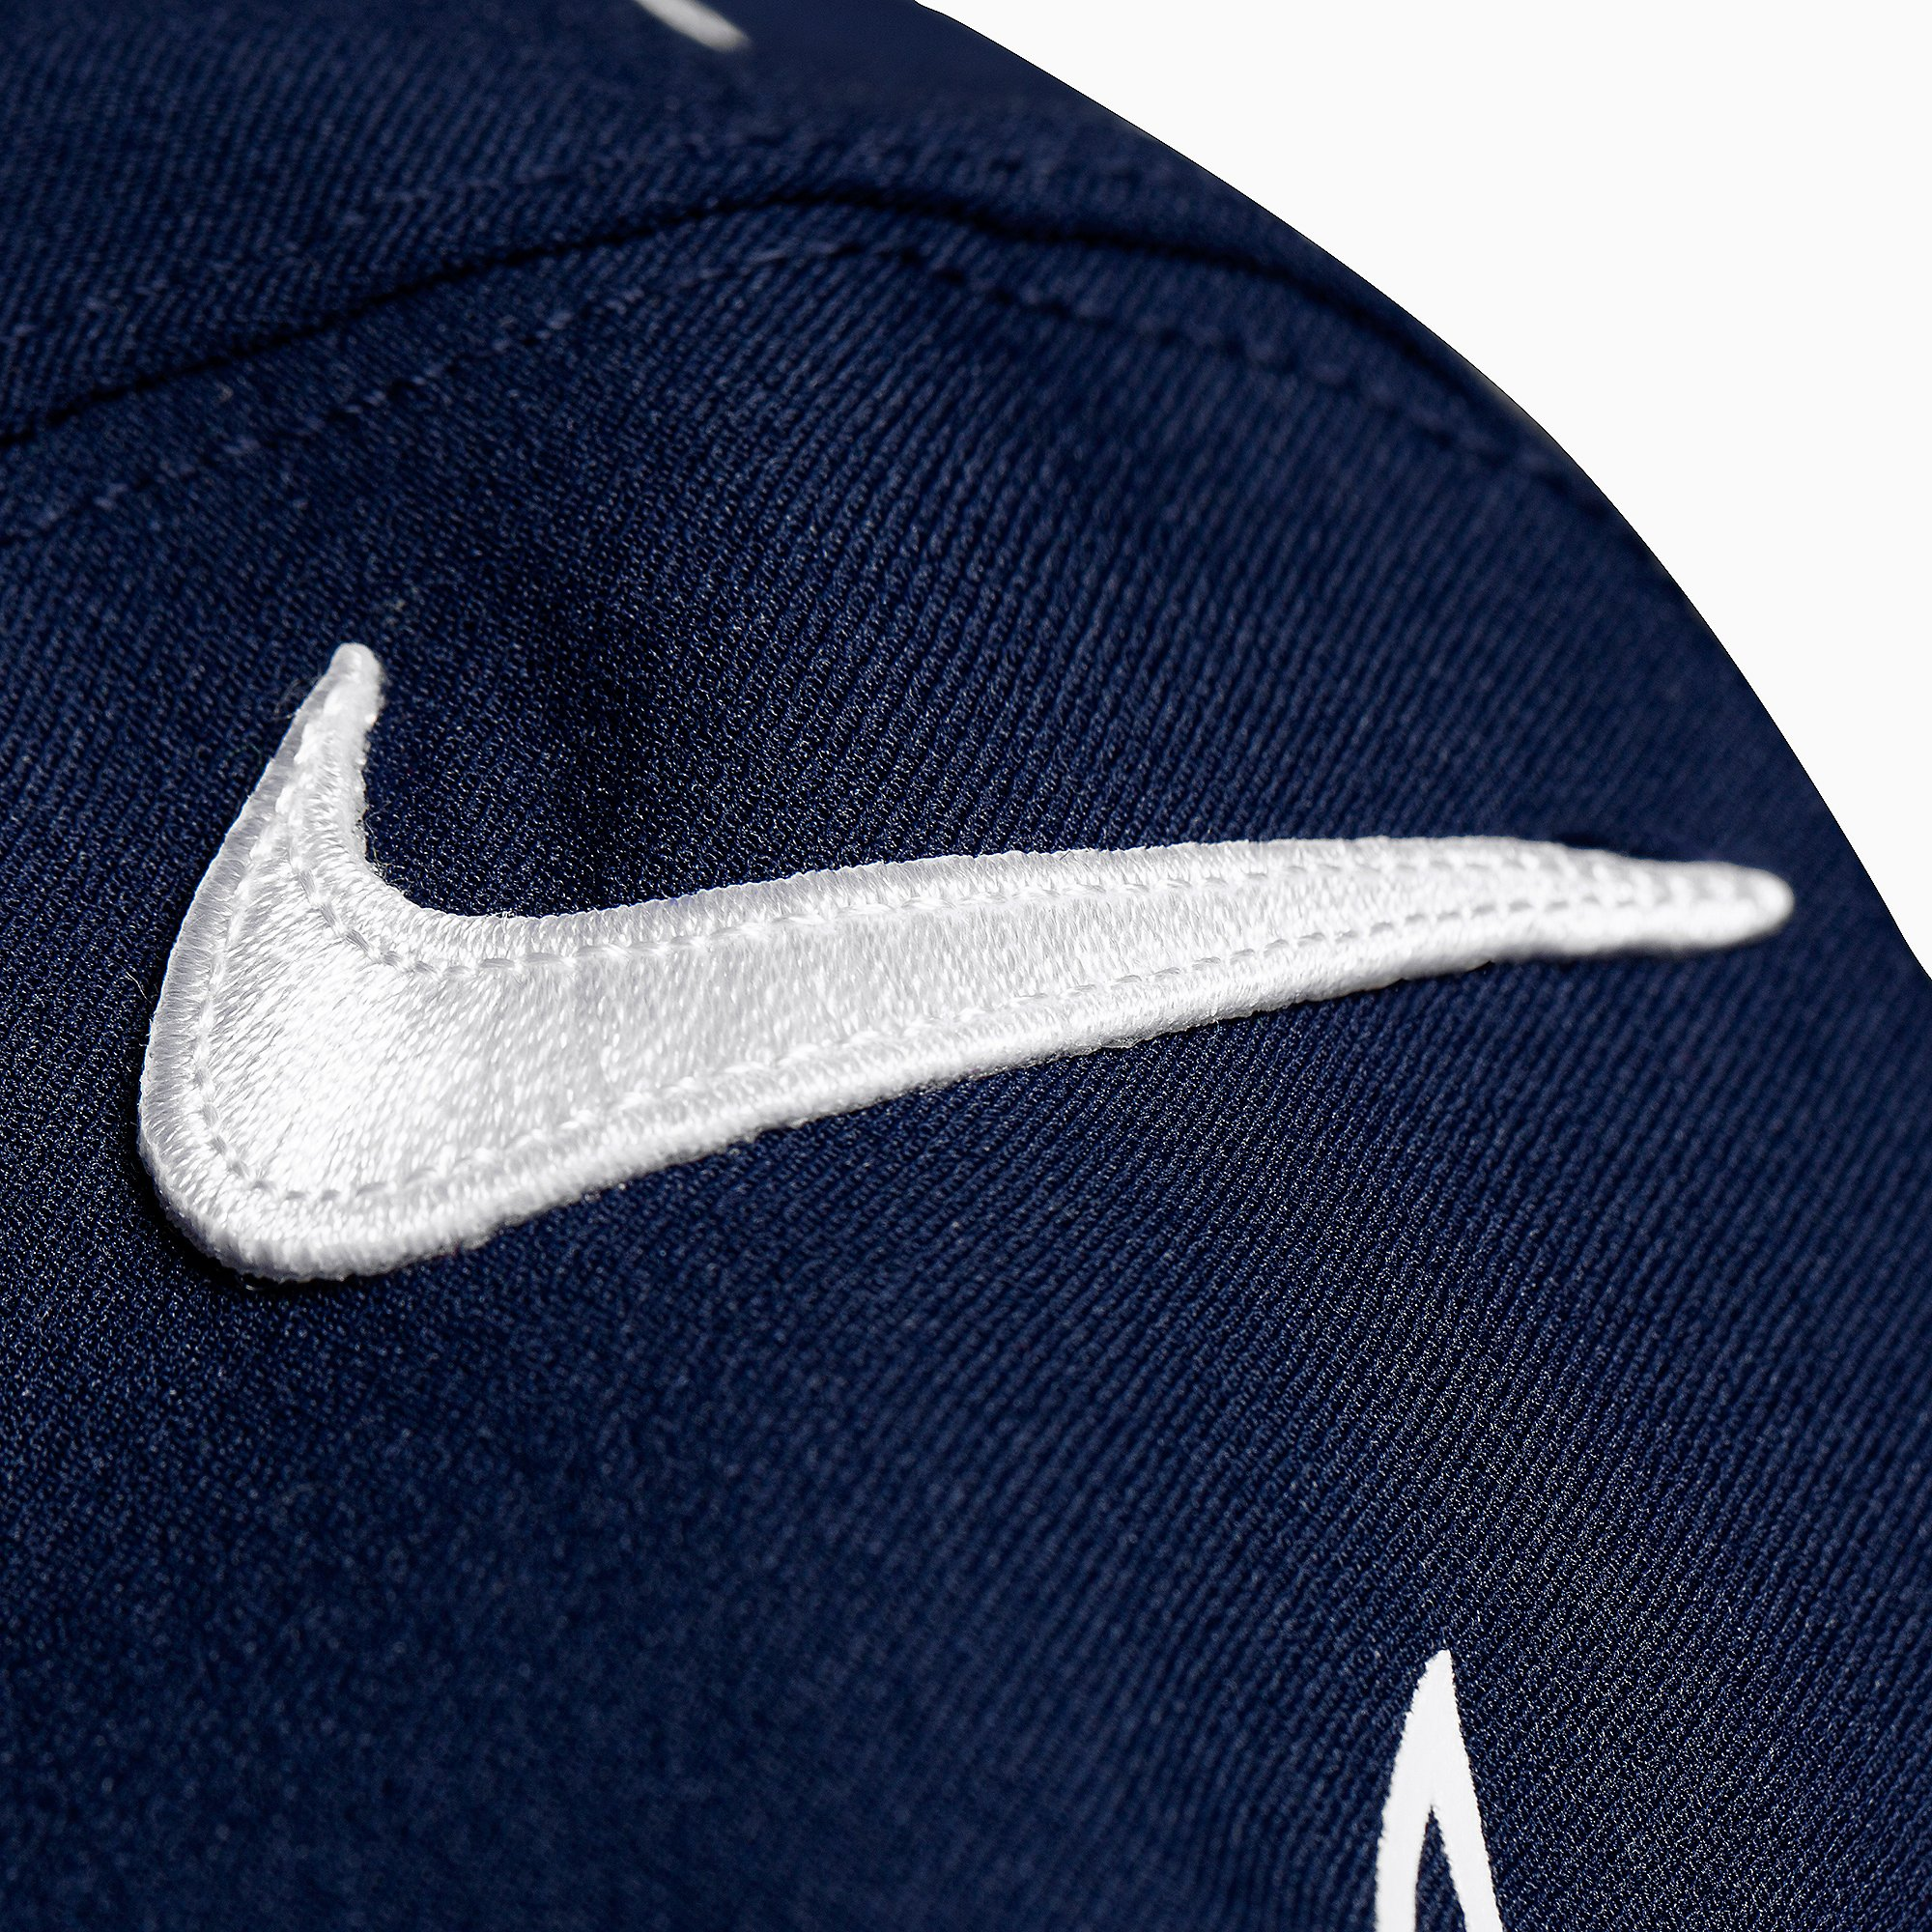 jason witten authentic jersey